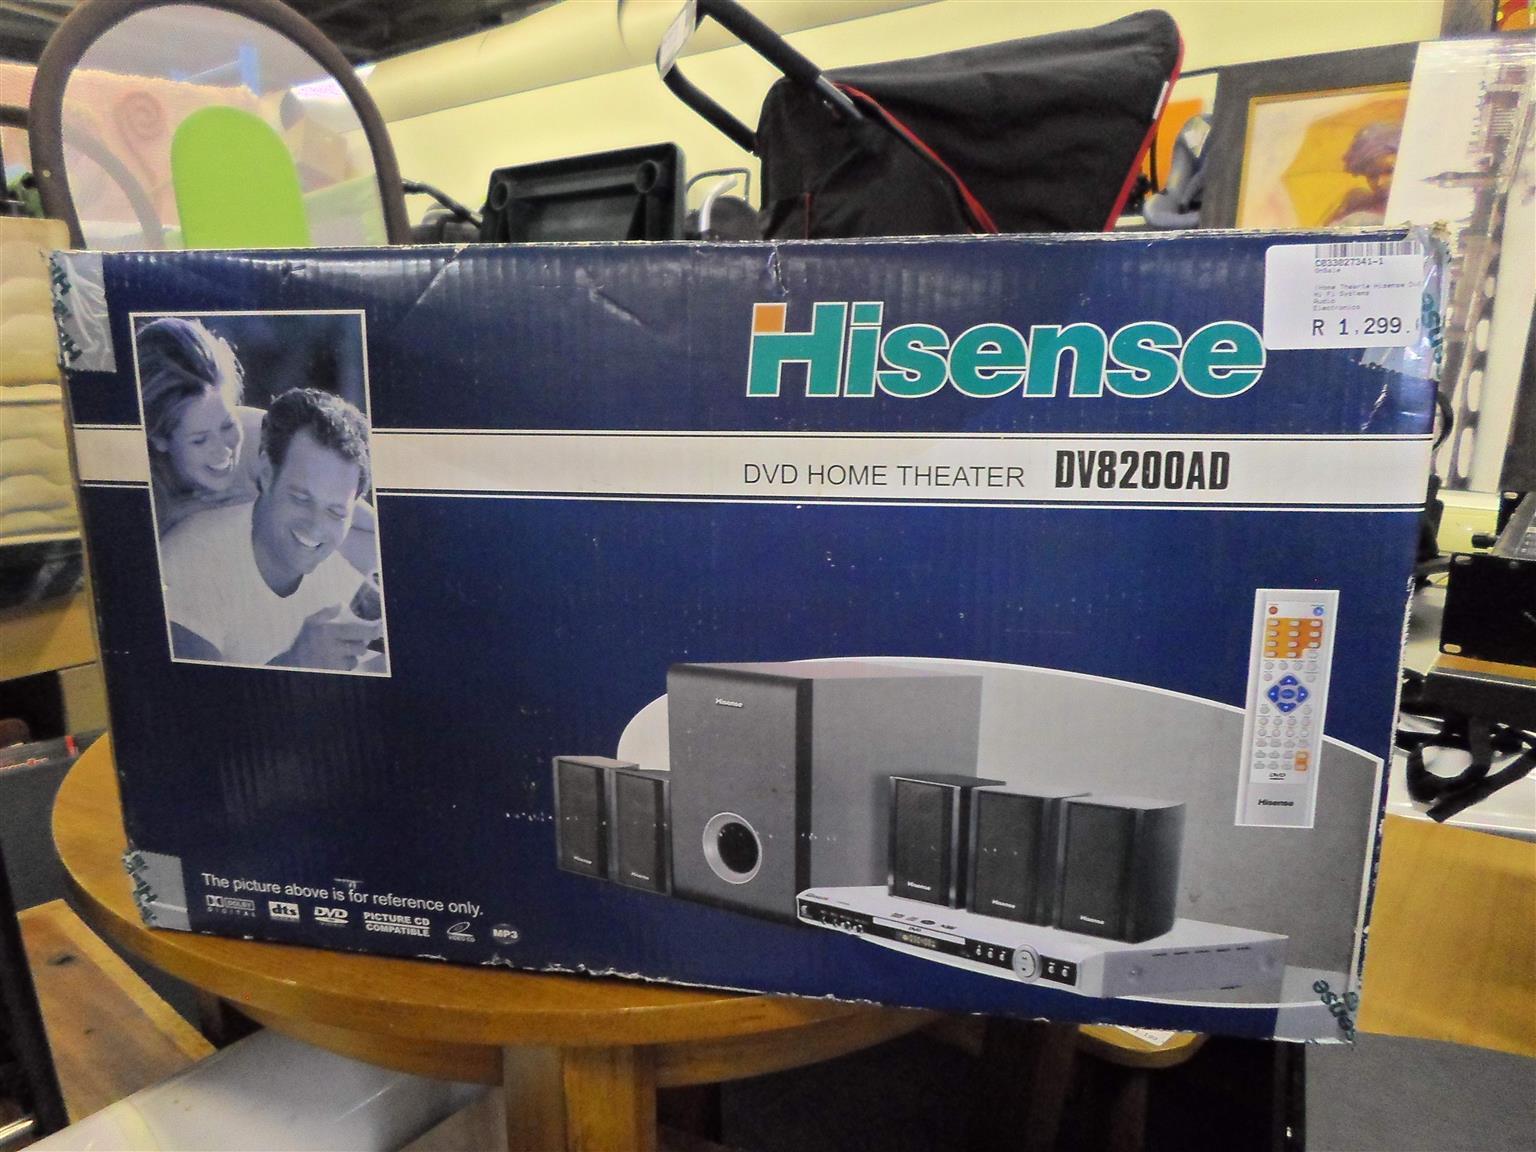 Hisense DV8200AD Home Theater